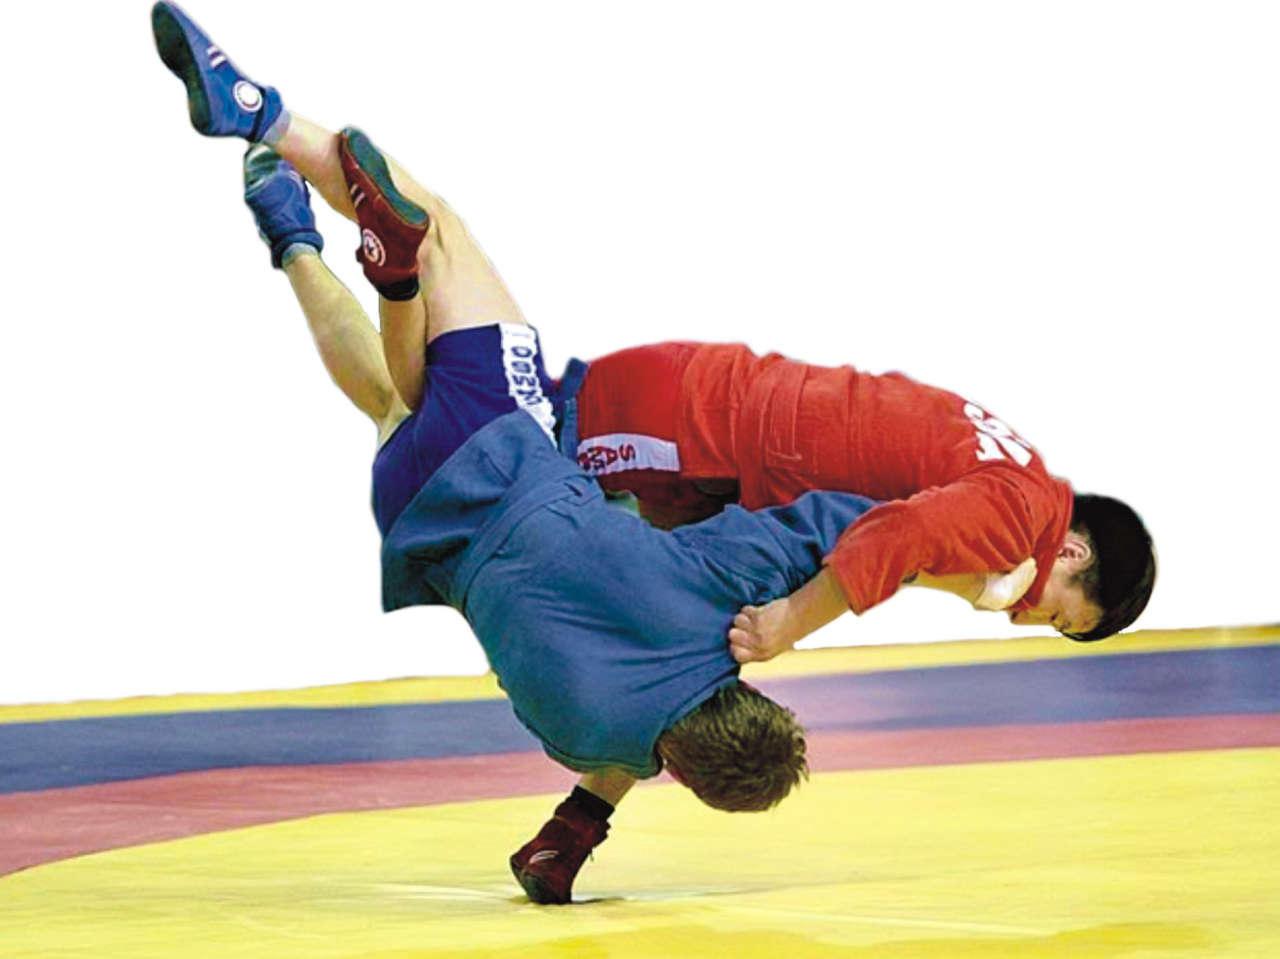 Japan Sambo Championships to be held in February despite COVID-19 threat